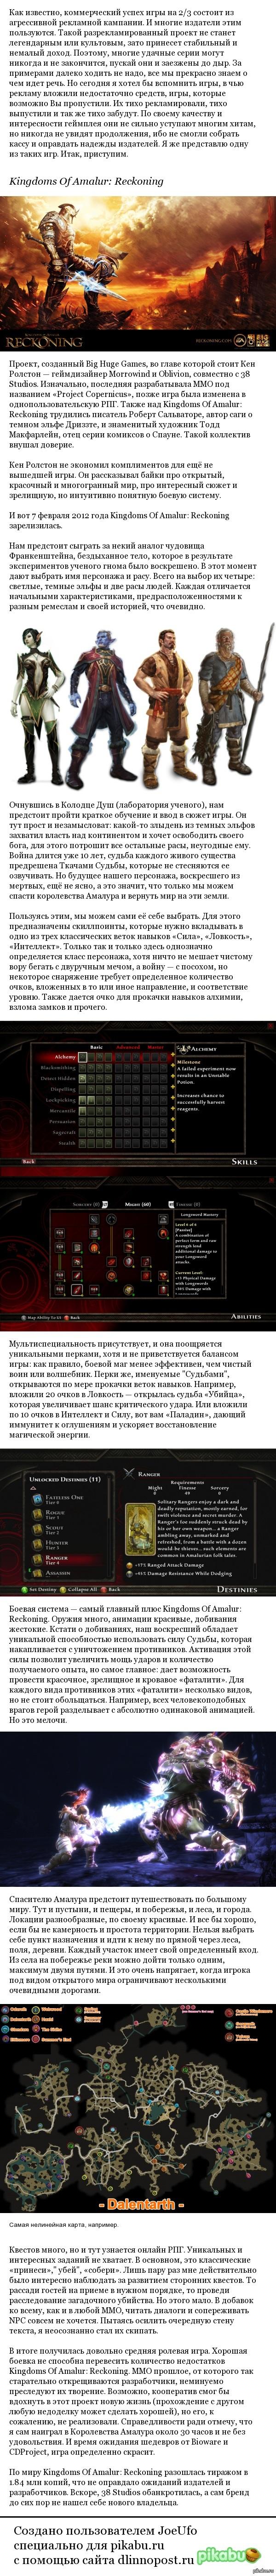 Invisible Games - Kingdoms of Amalur: Rekoning